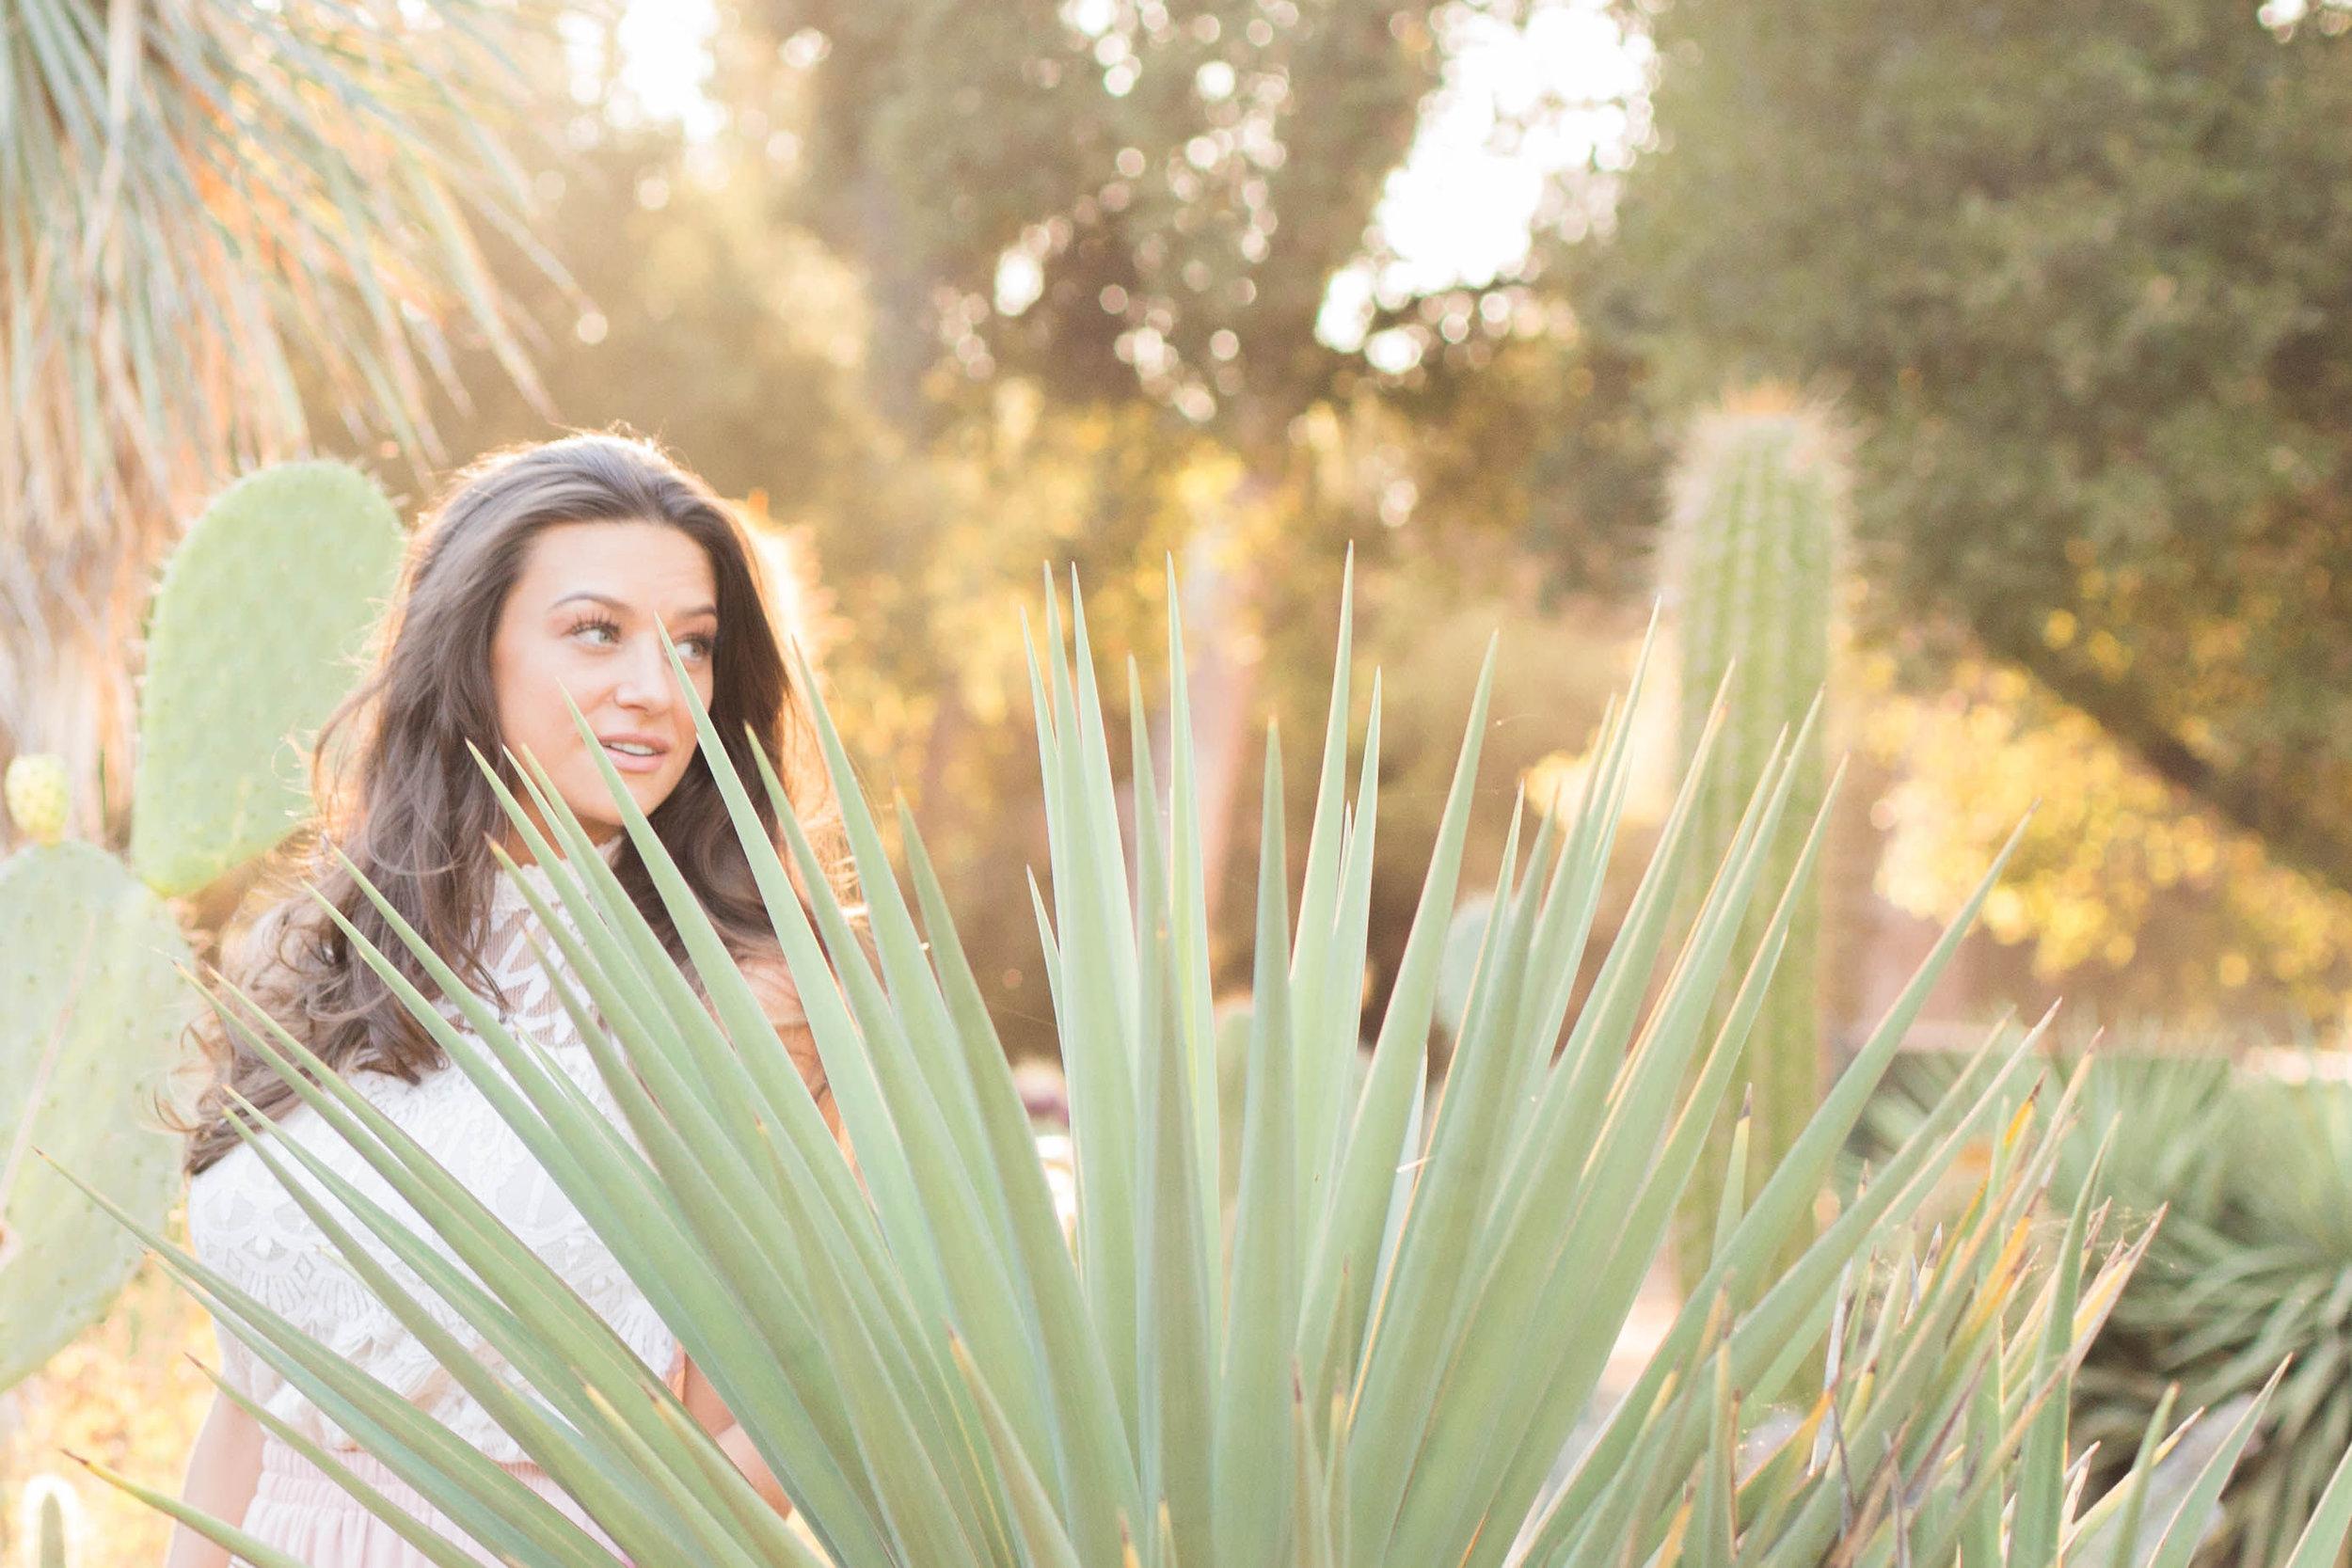 cassandra mcclure_stanford_cactus-garden1155.jpg